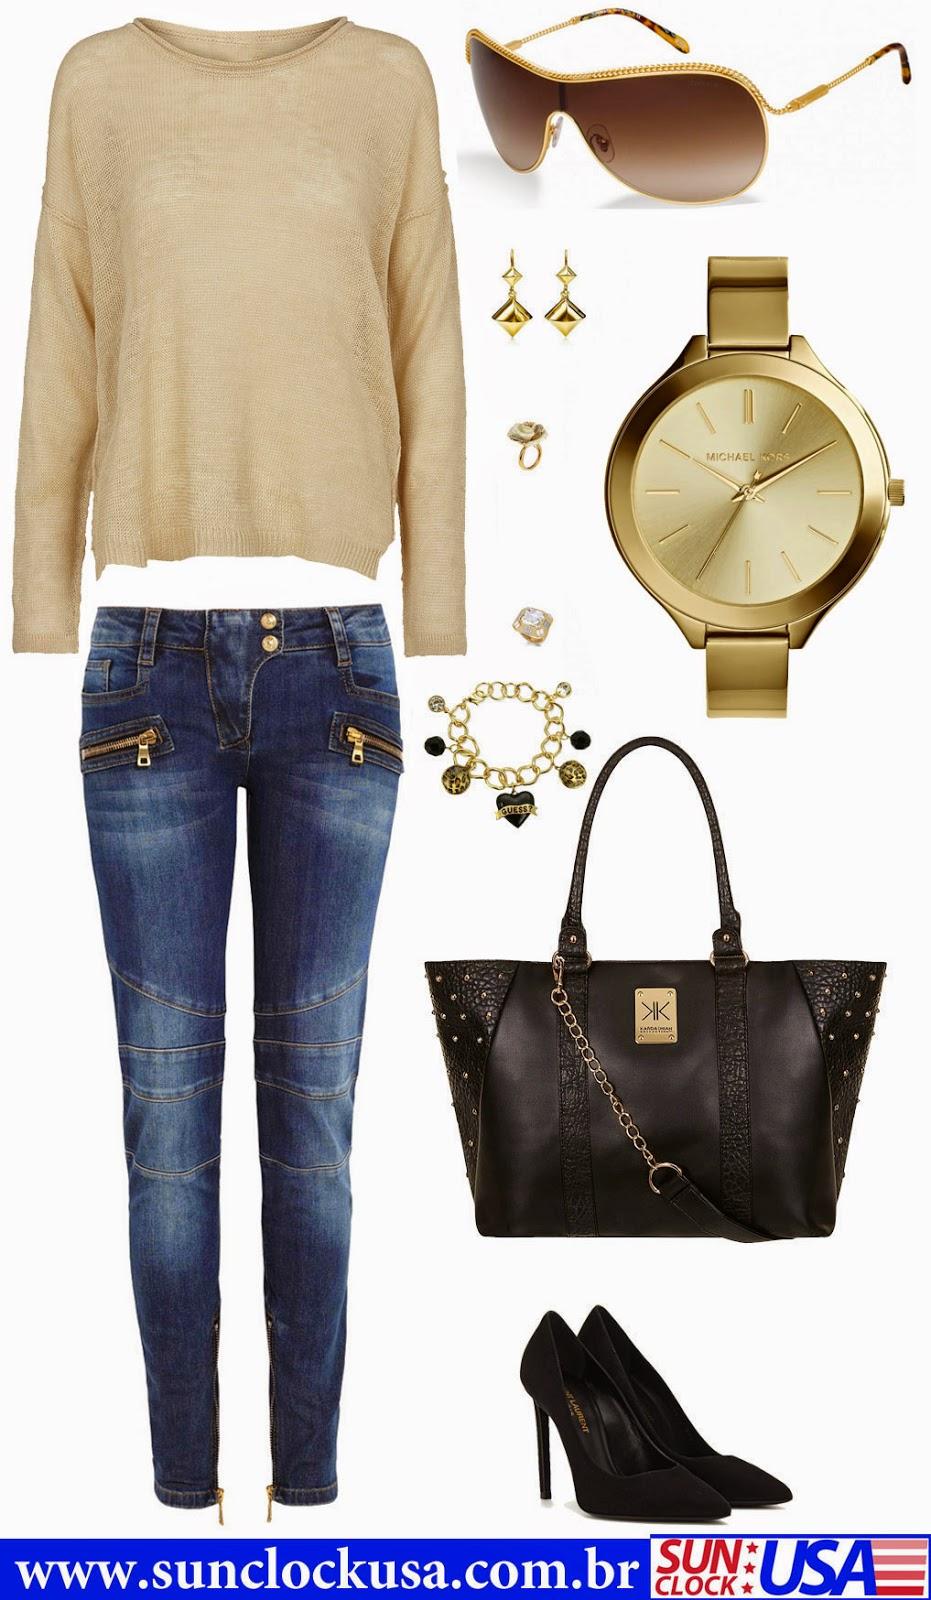 Relógios Michael Kors  e Óculos Tiffany & Co.